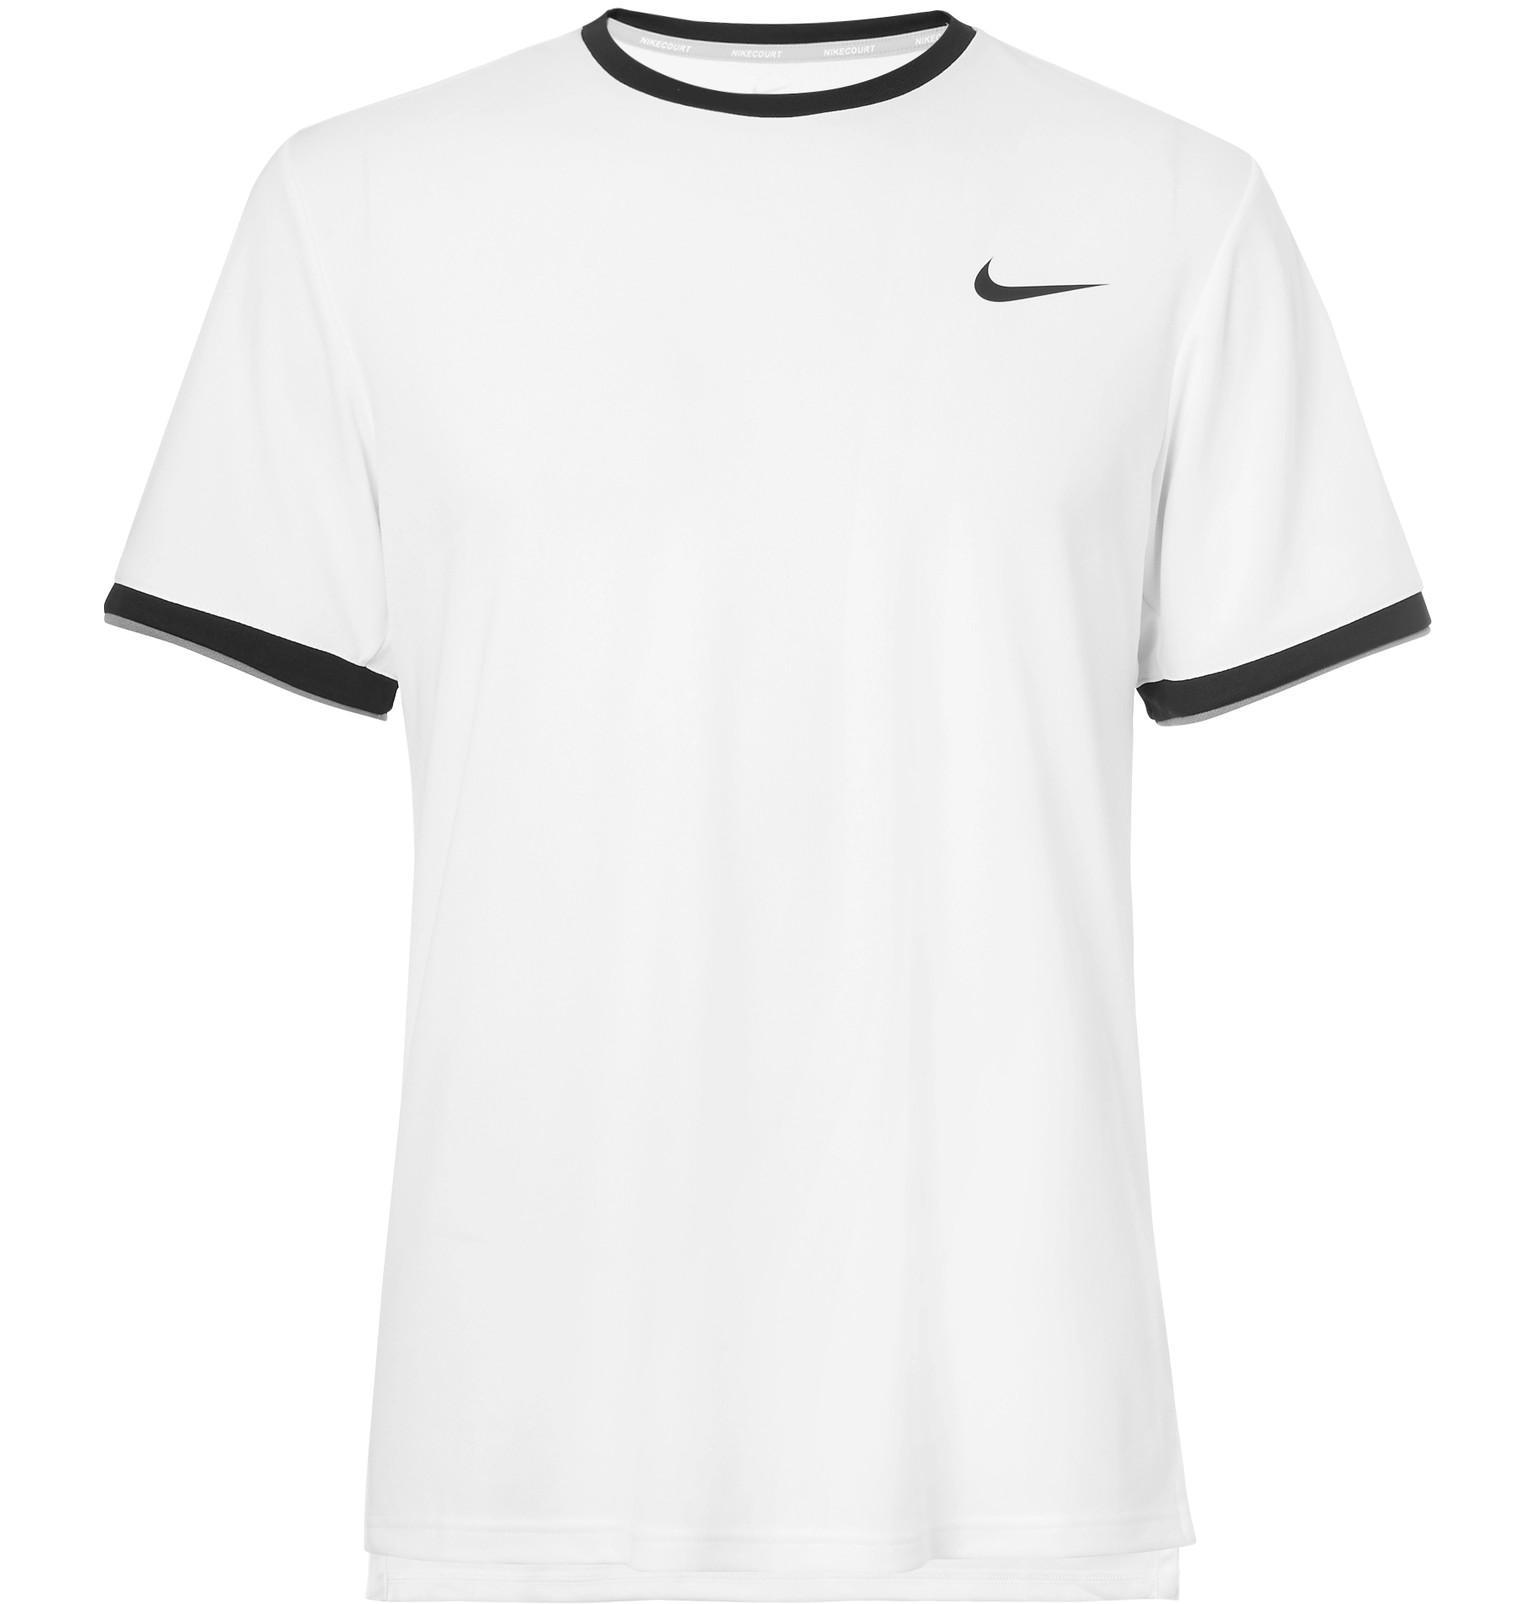 688dcc9a4366 Lyst - Nike Nikecourt Dry Dri-fit Mesh Tennis T-shirt in White for Men